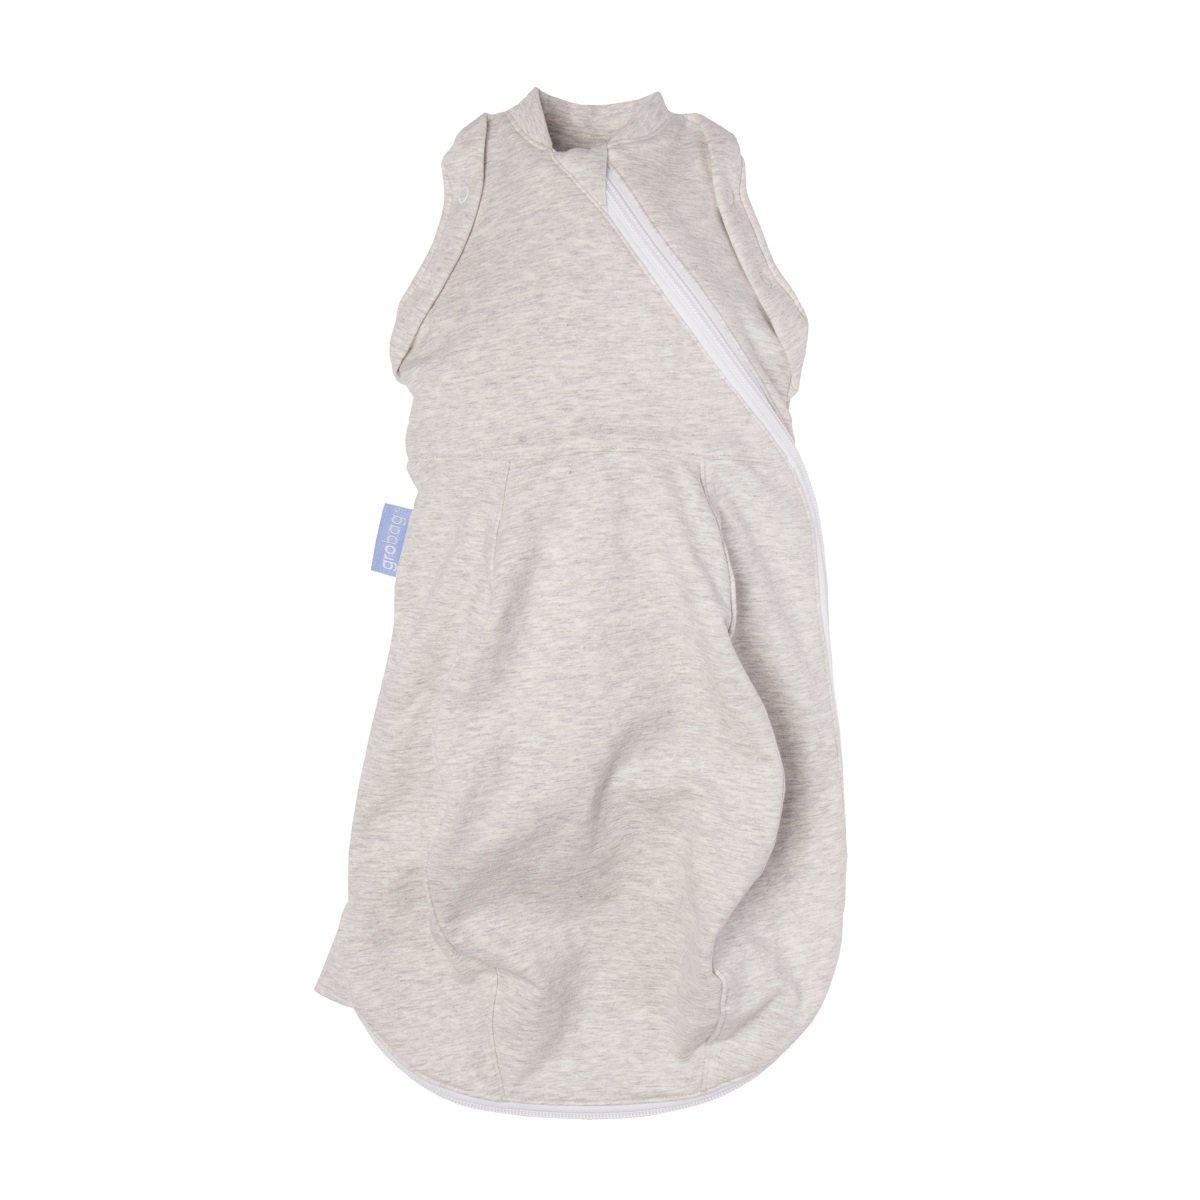 包裹睡袋 - 輕盈版 - 灰色